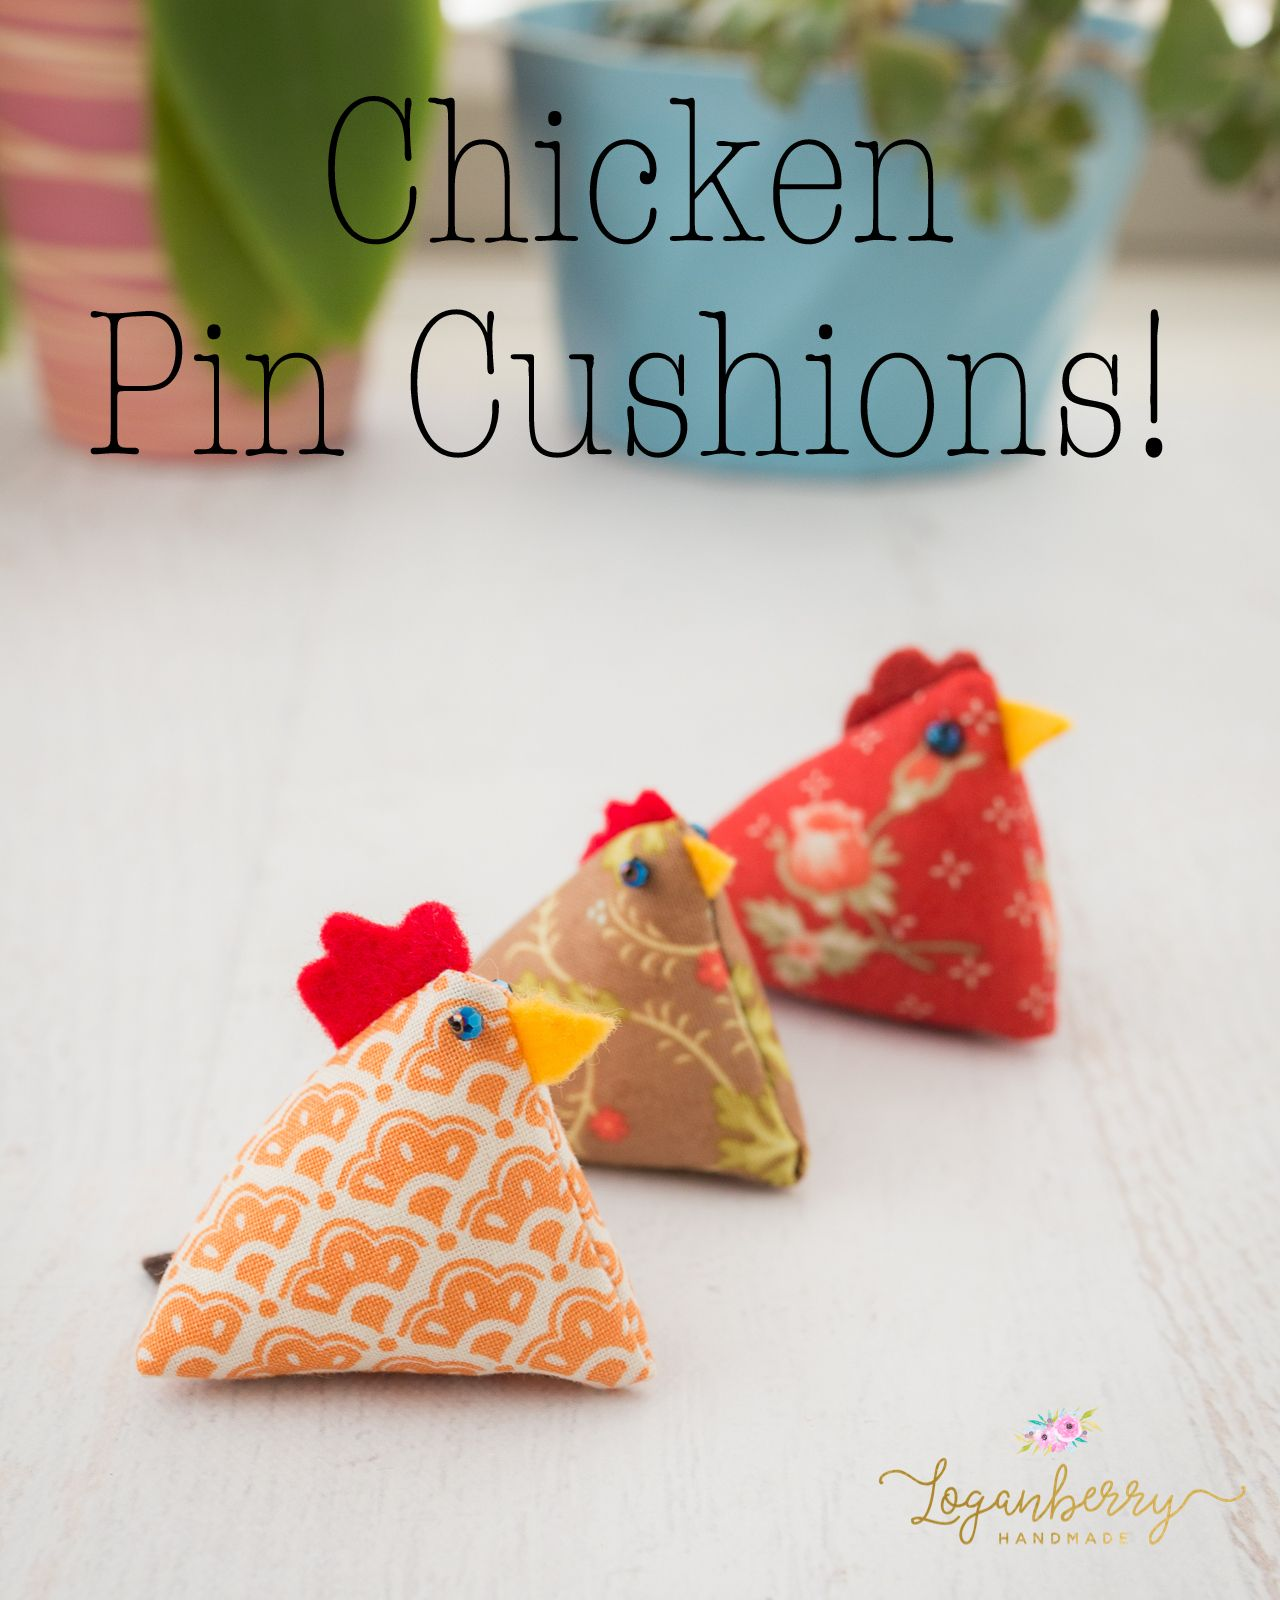 chicken pin cushions tutorial, free sewing pattern and tutorial, how to sew a chicken pin cushion, diy pin cushions, chicken bean bags